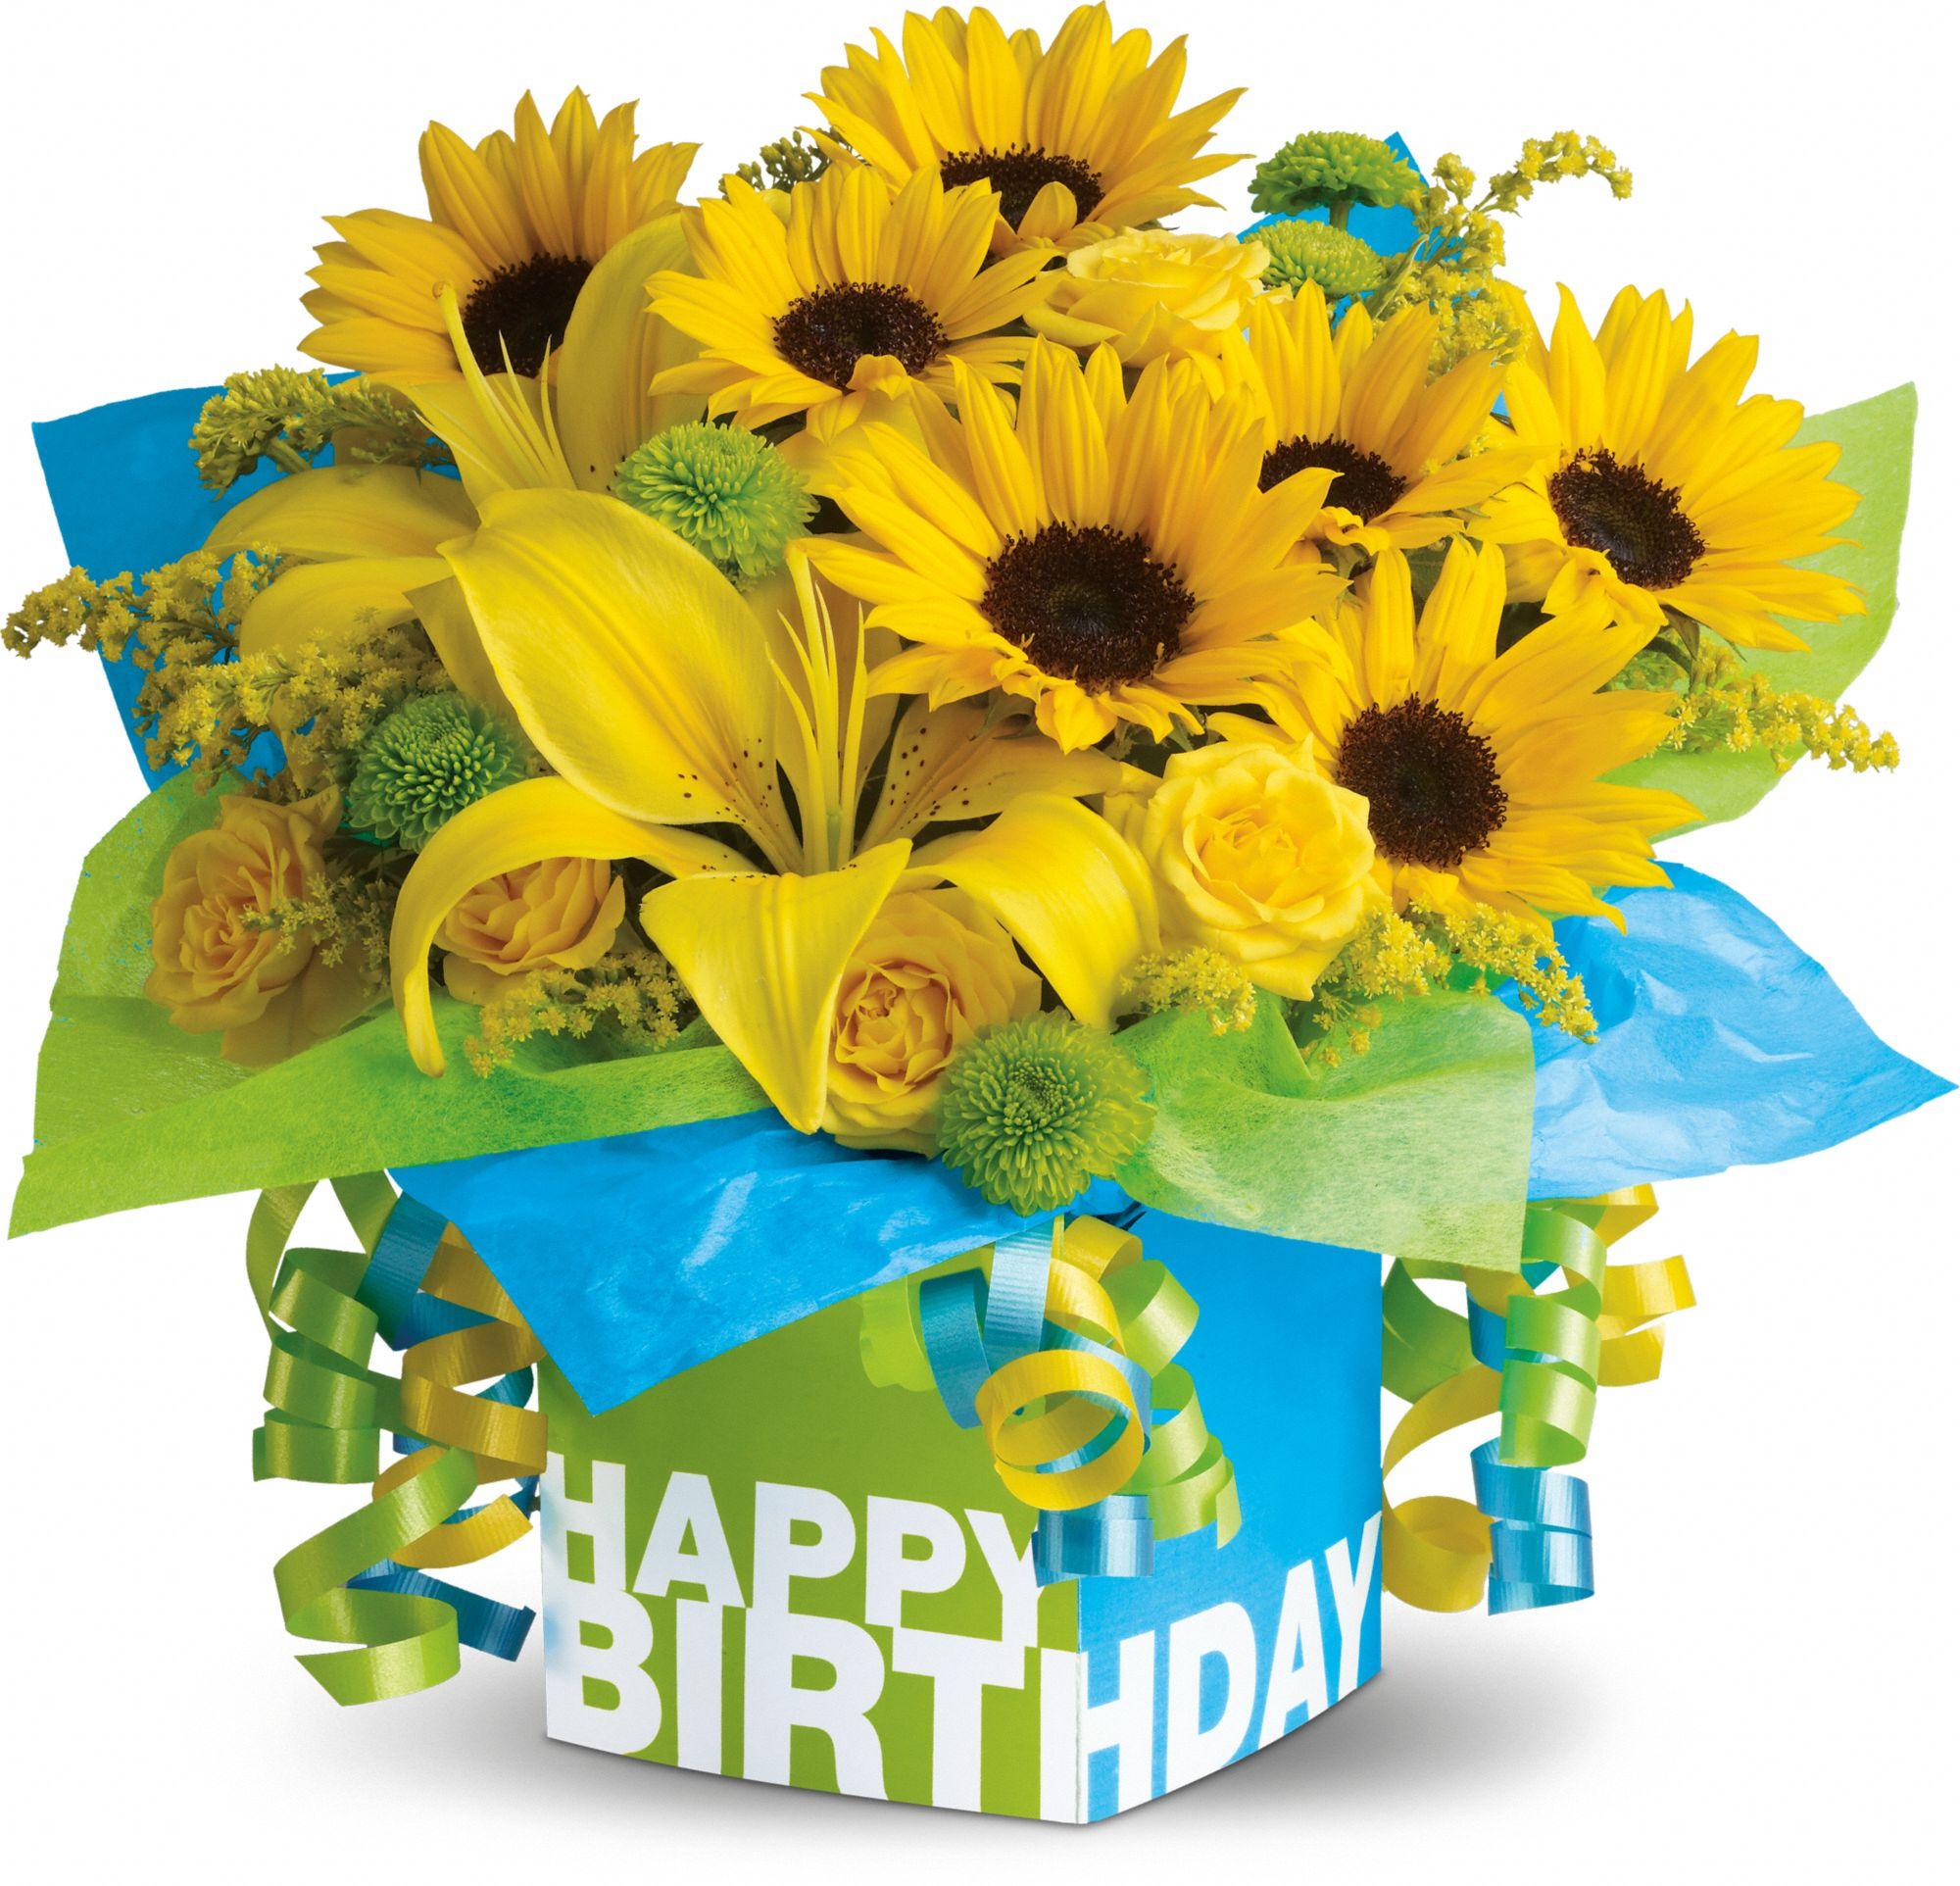 Bouquet clipart happy birthday  Sunflowers Teleflora's bouquet Teleflora's